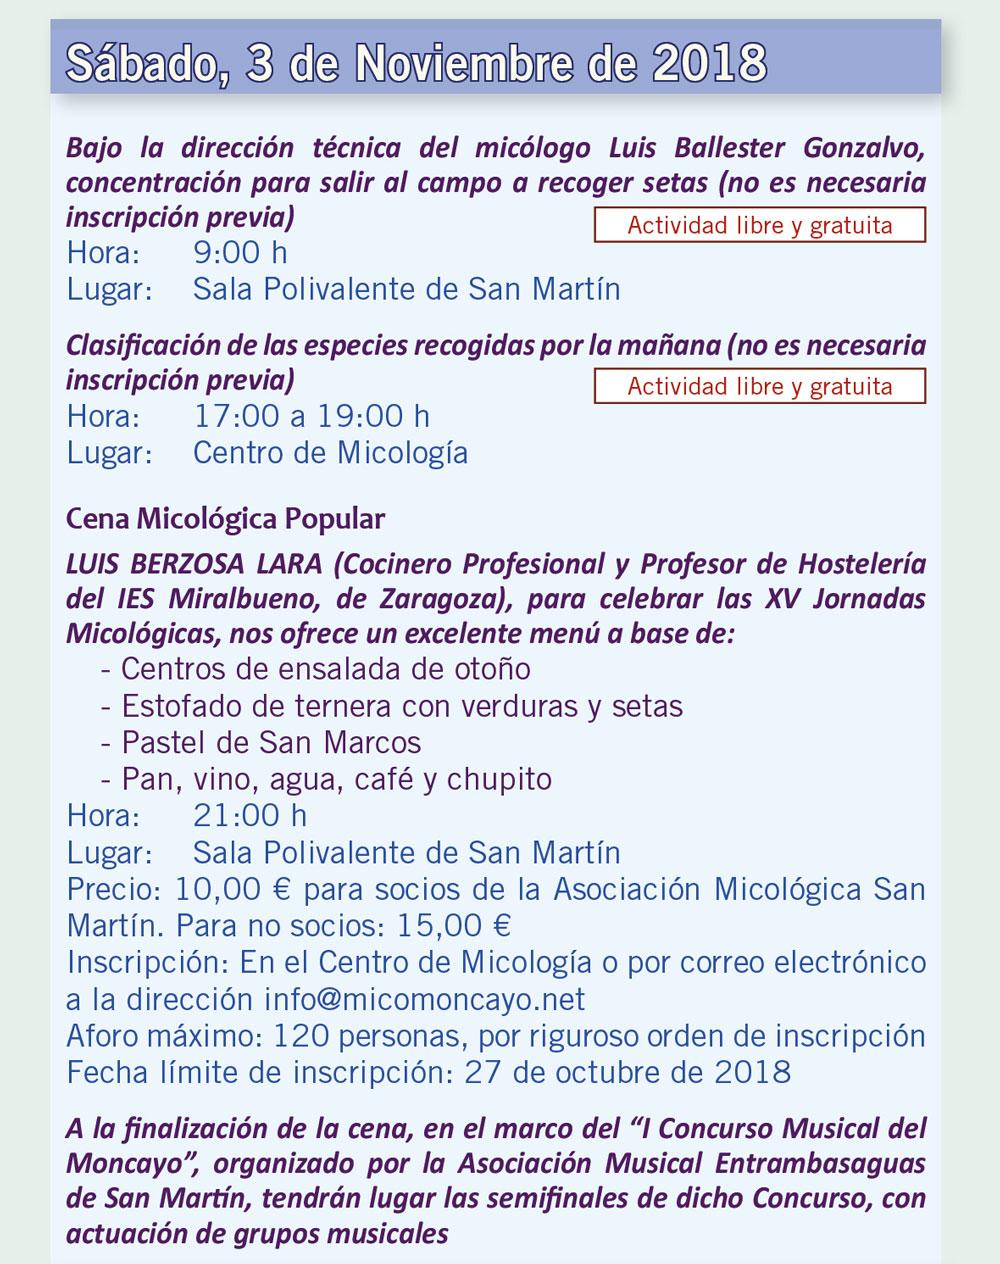 Actividades día 3 de noviembre XV Jornadas Micológicas Otoño 2018 #MicoMoncayo